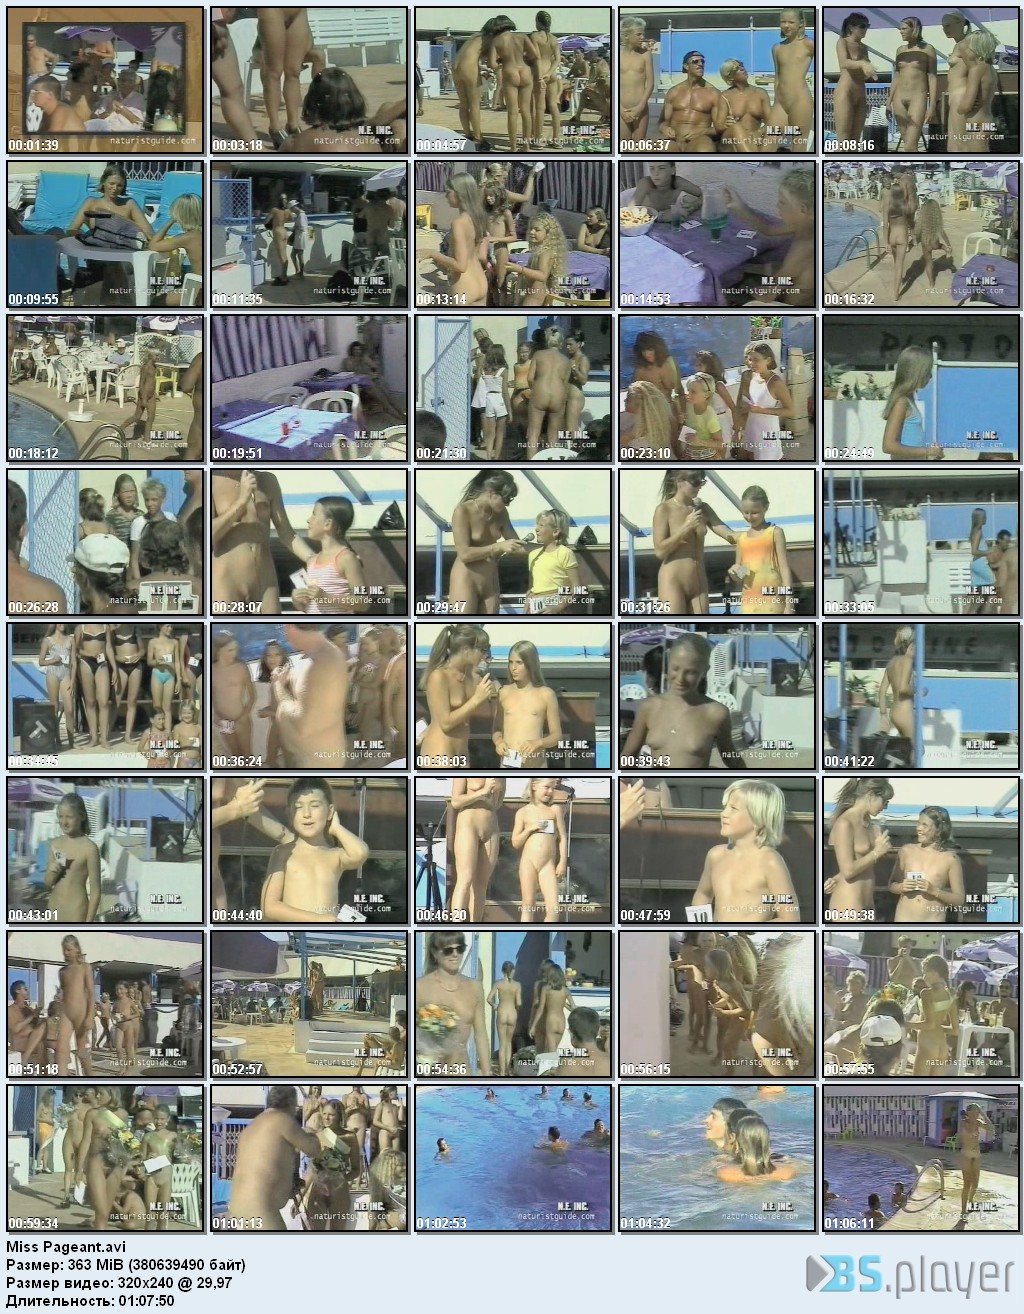 1999 pageant junior nude